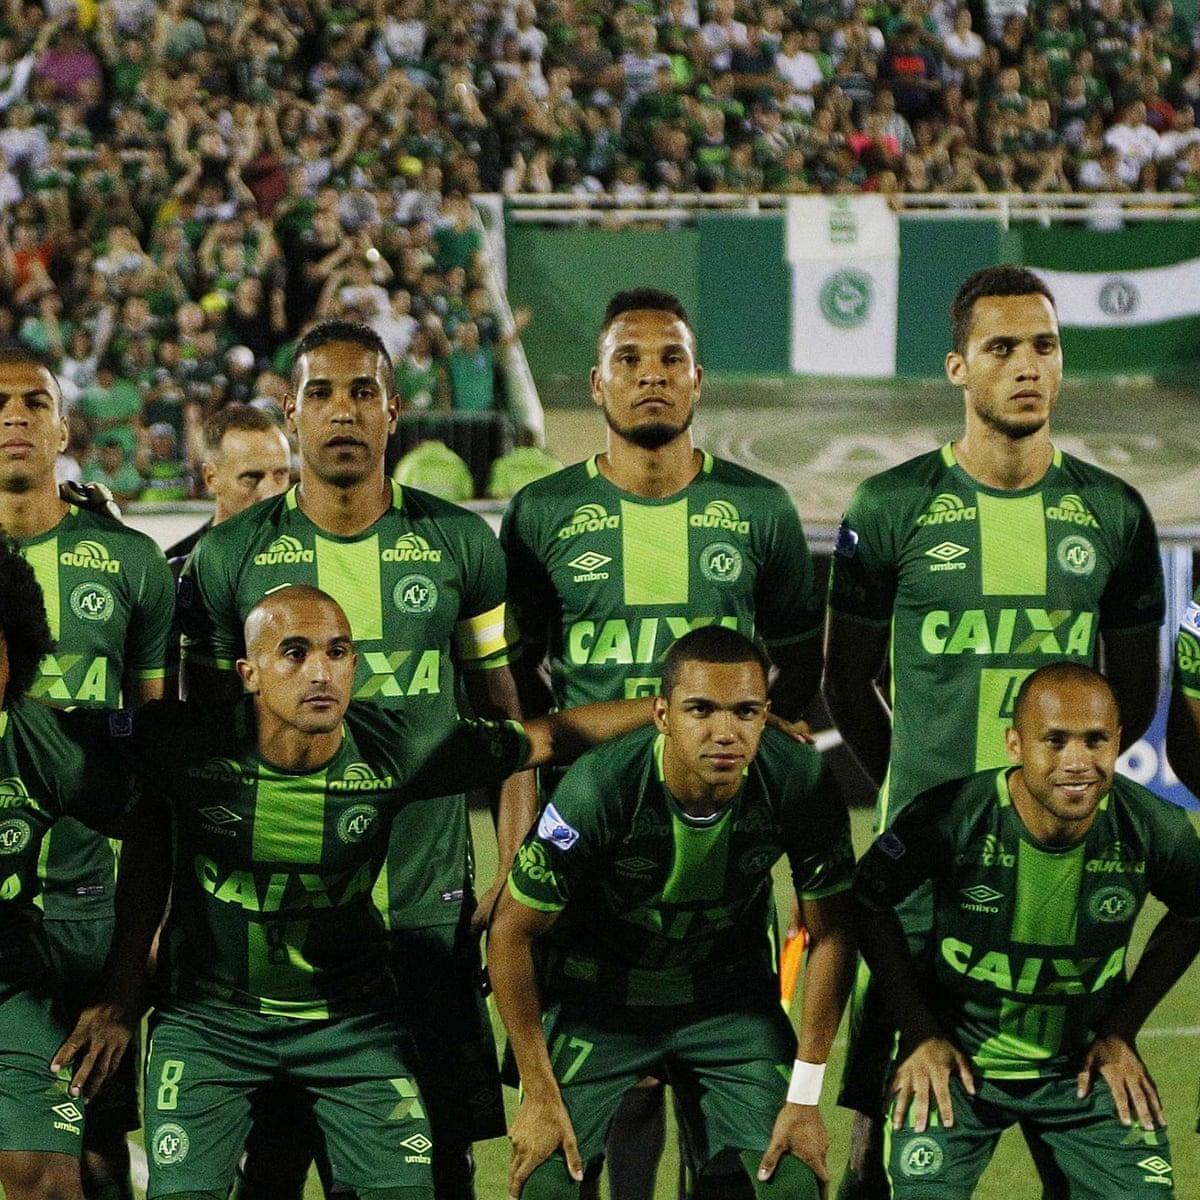 Brazilian team Chapecoense among those on board crashed plane | World news  | The Guardian